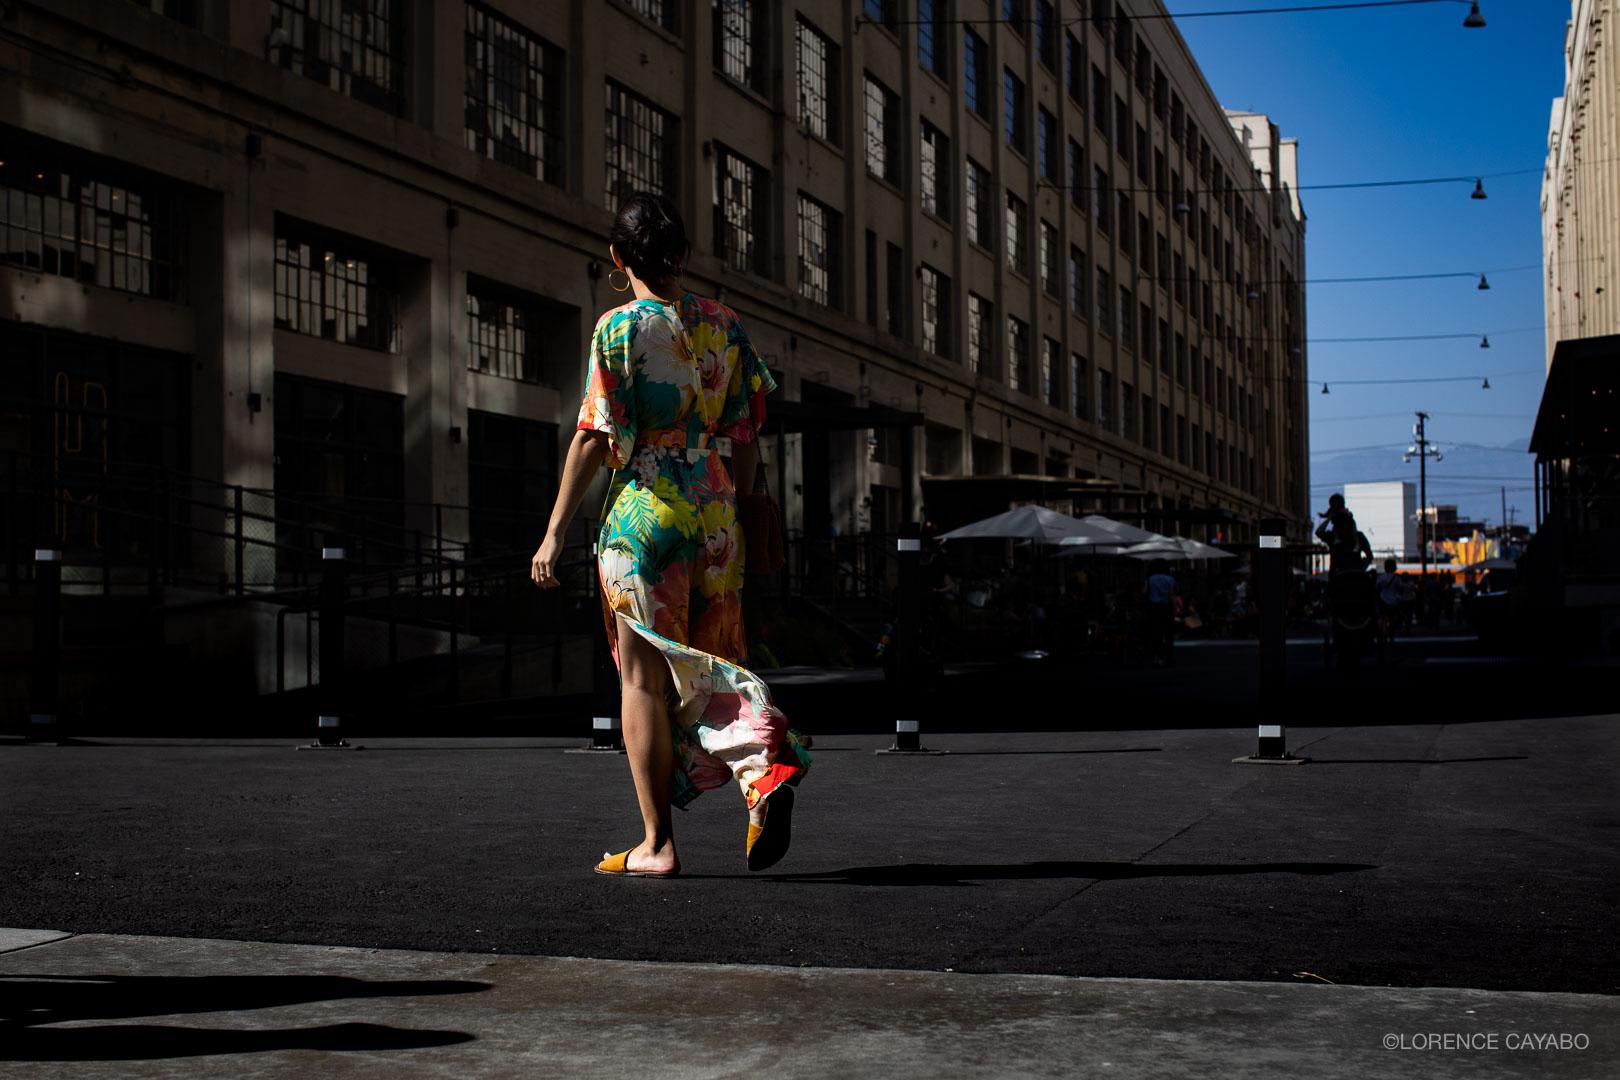 lorence cayabo - street-4.jpg